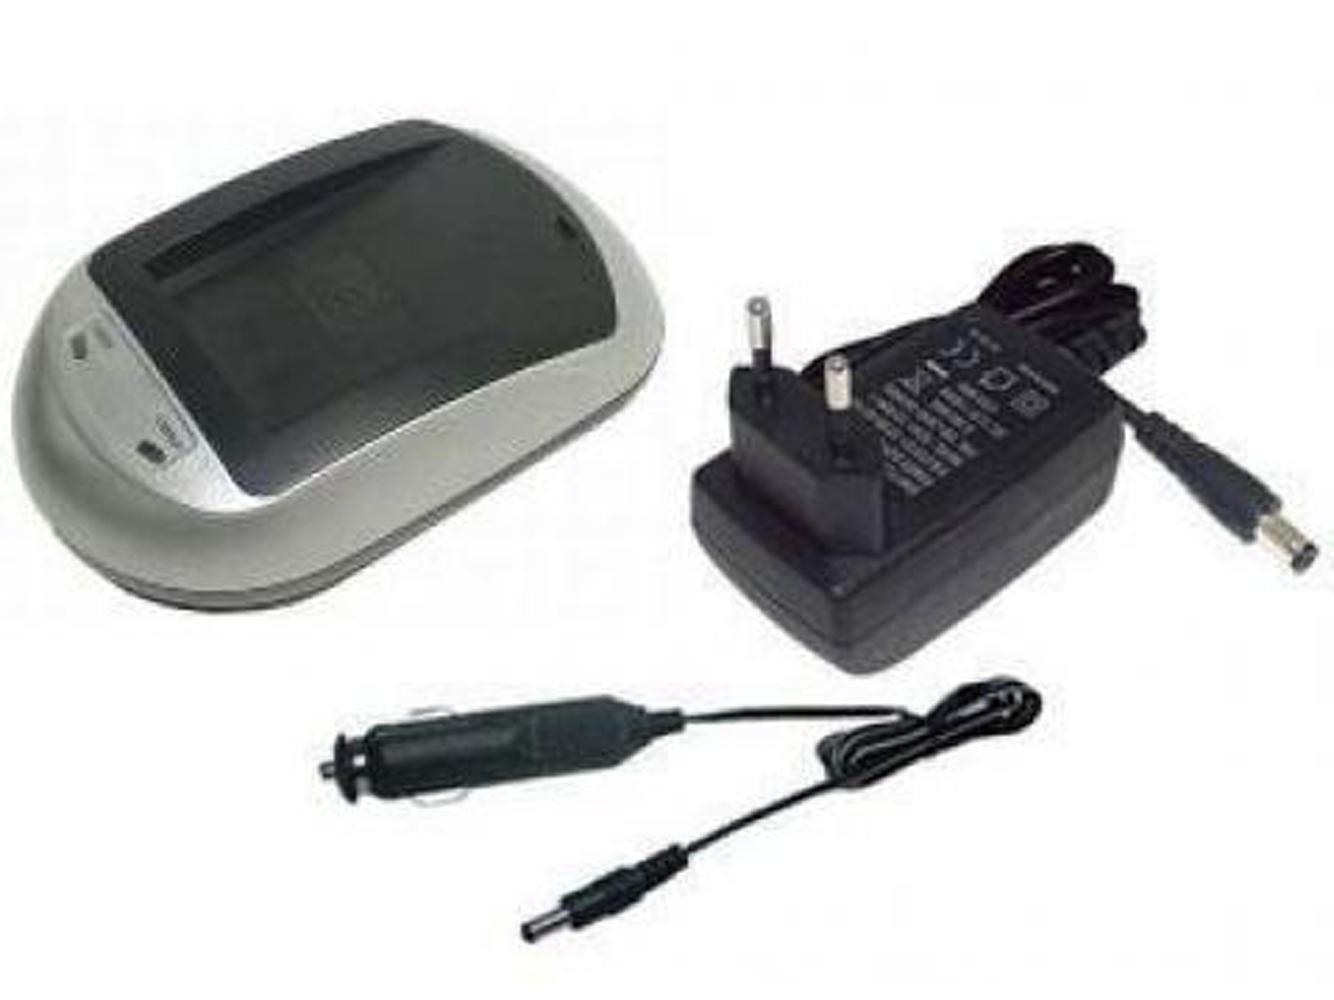 Battery Charger for CANON BP-208, BP-308, BP-308B, BP-308S, BP-315